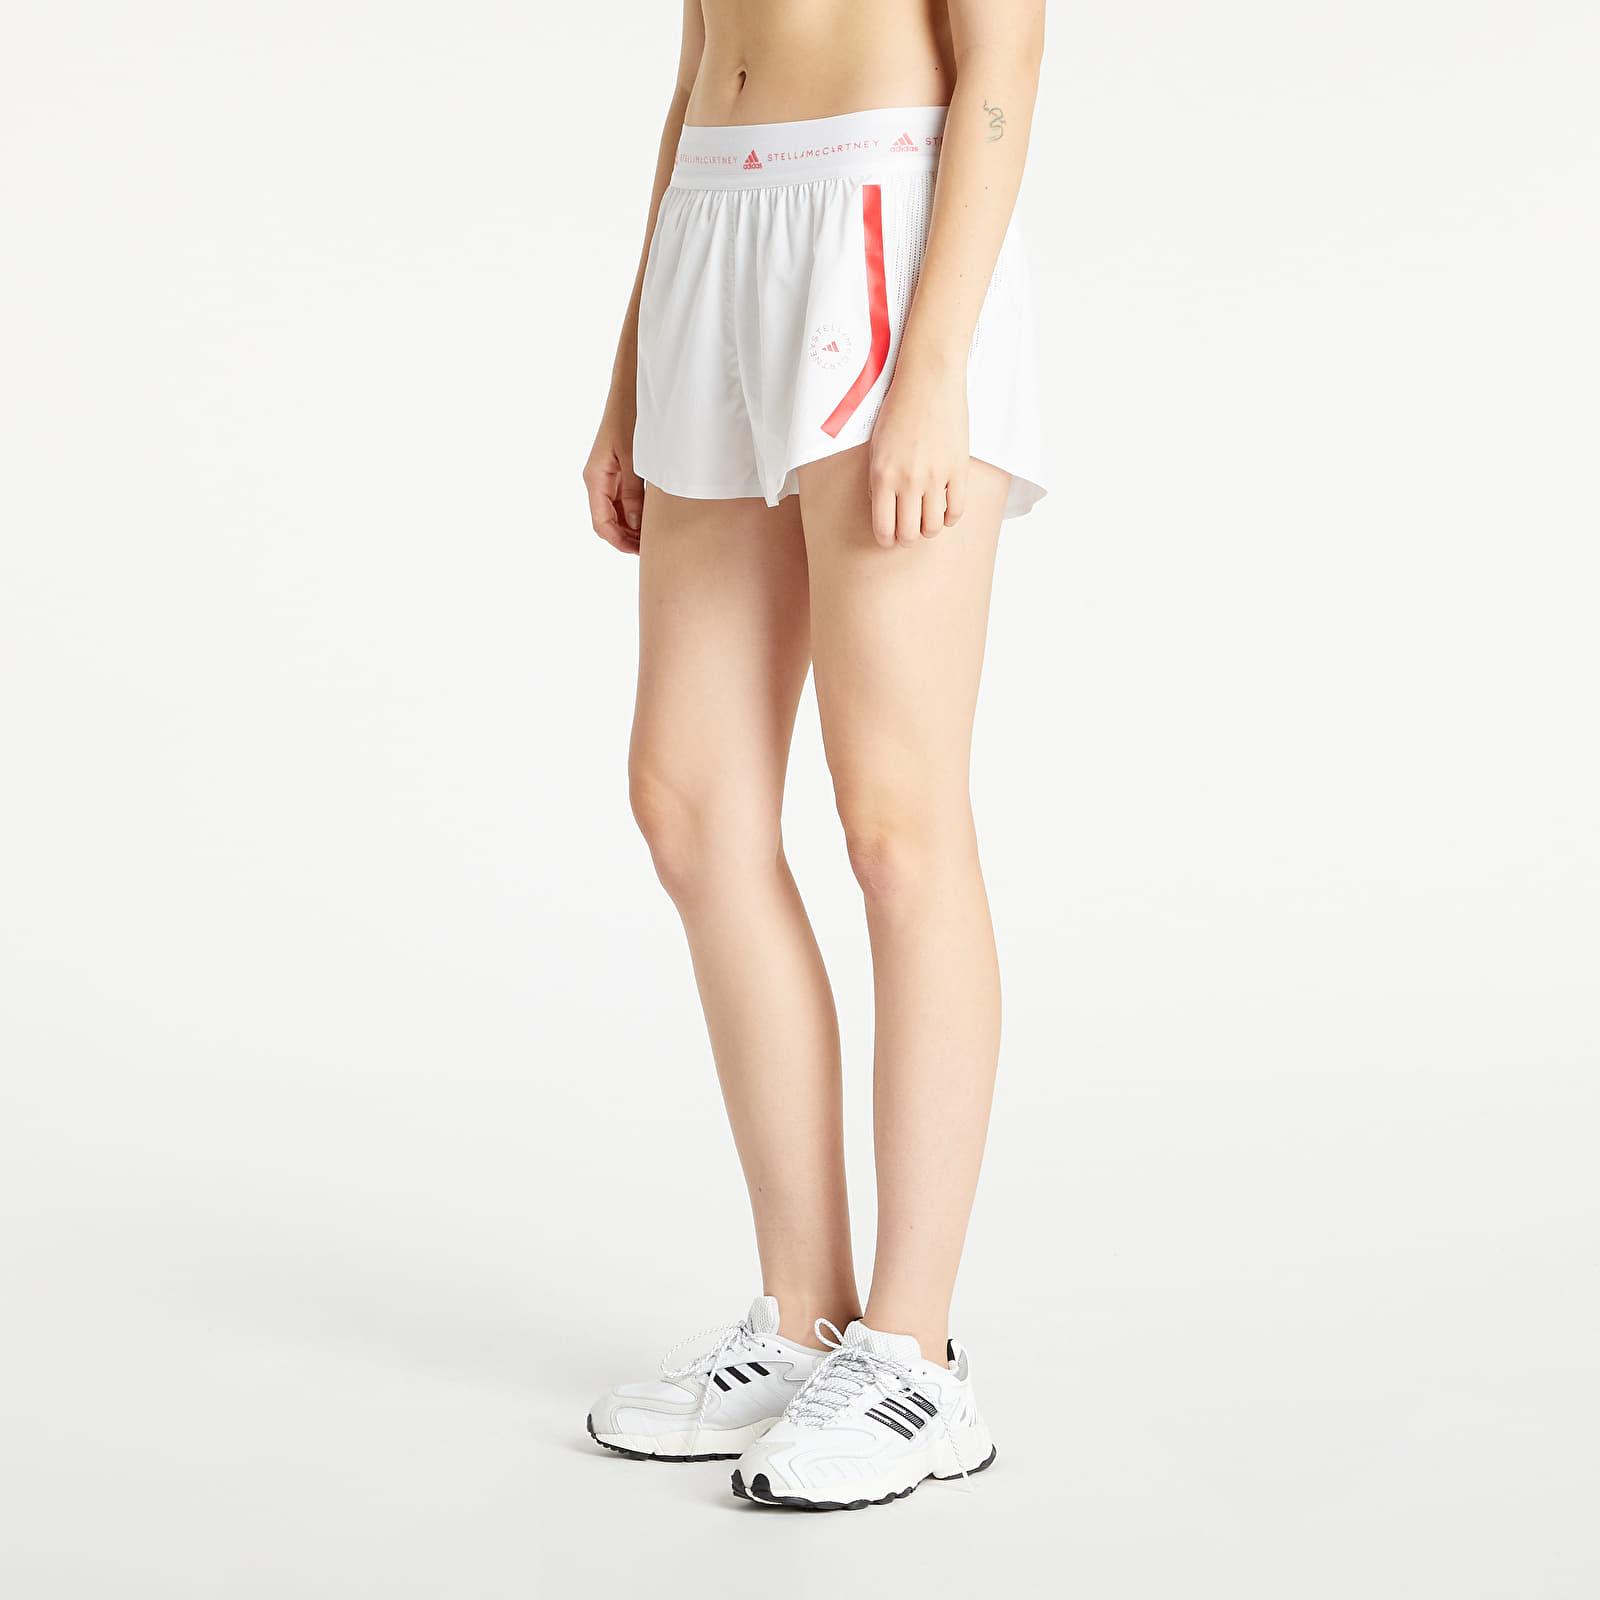 adidas x Stella McCartney Truepace Shorts White S